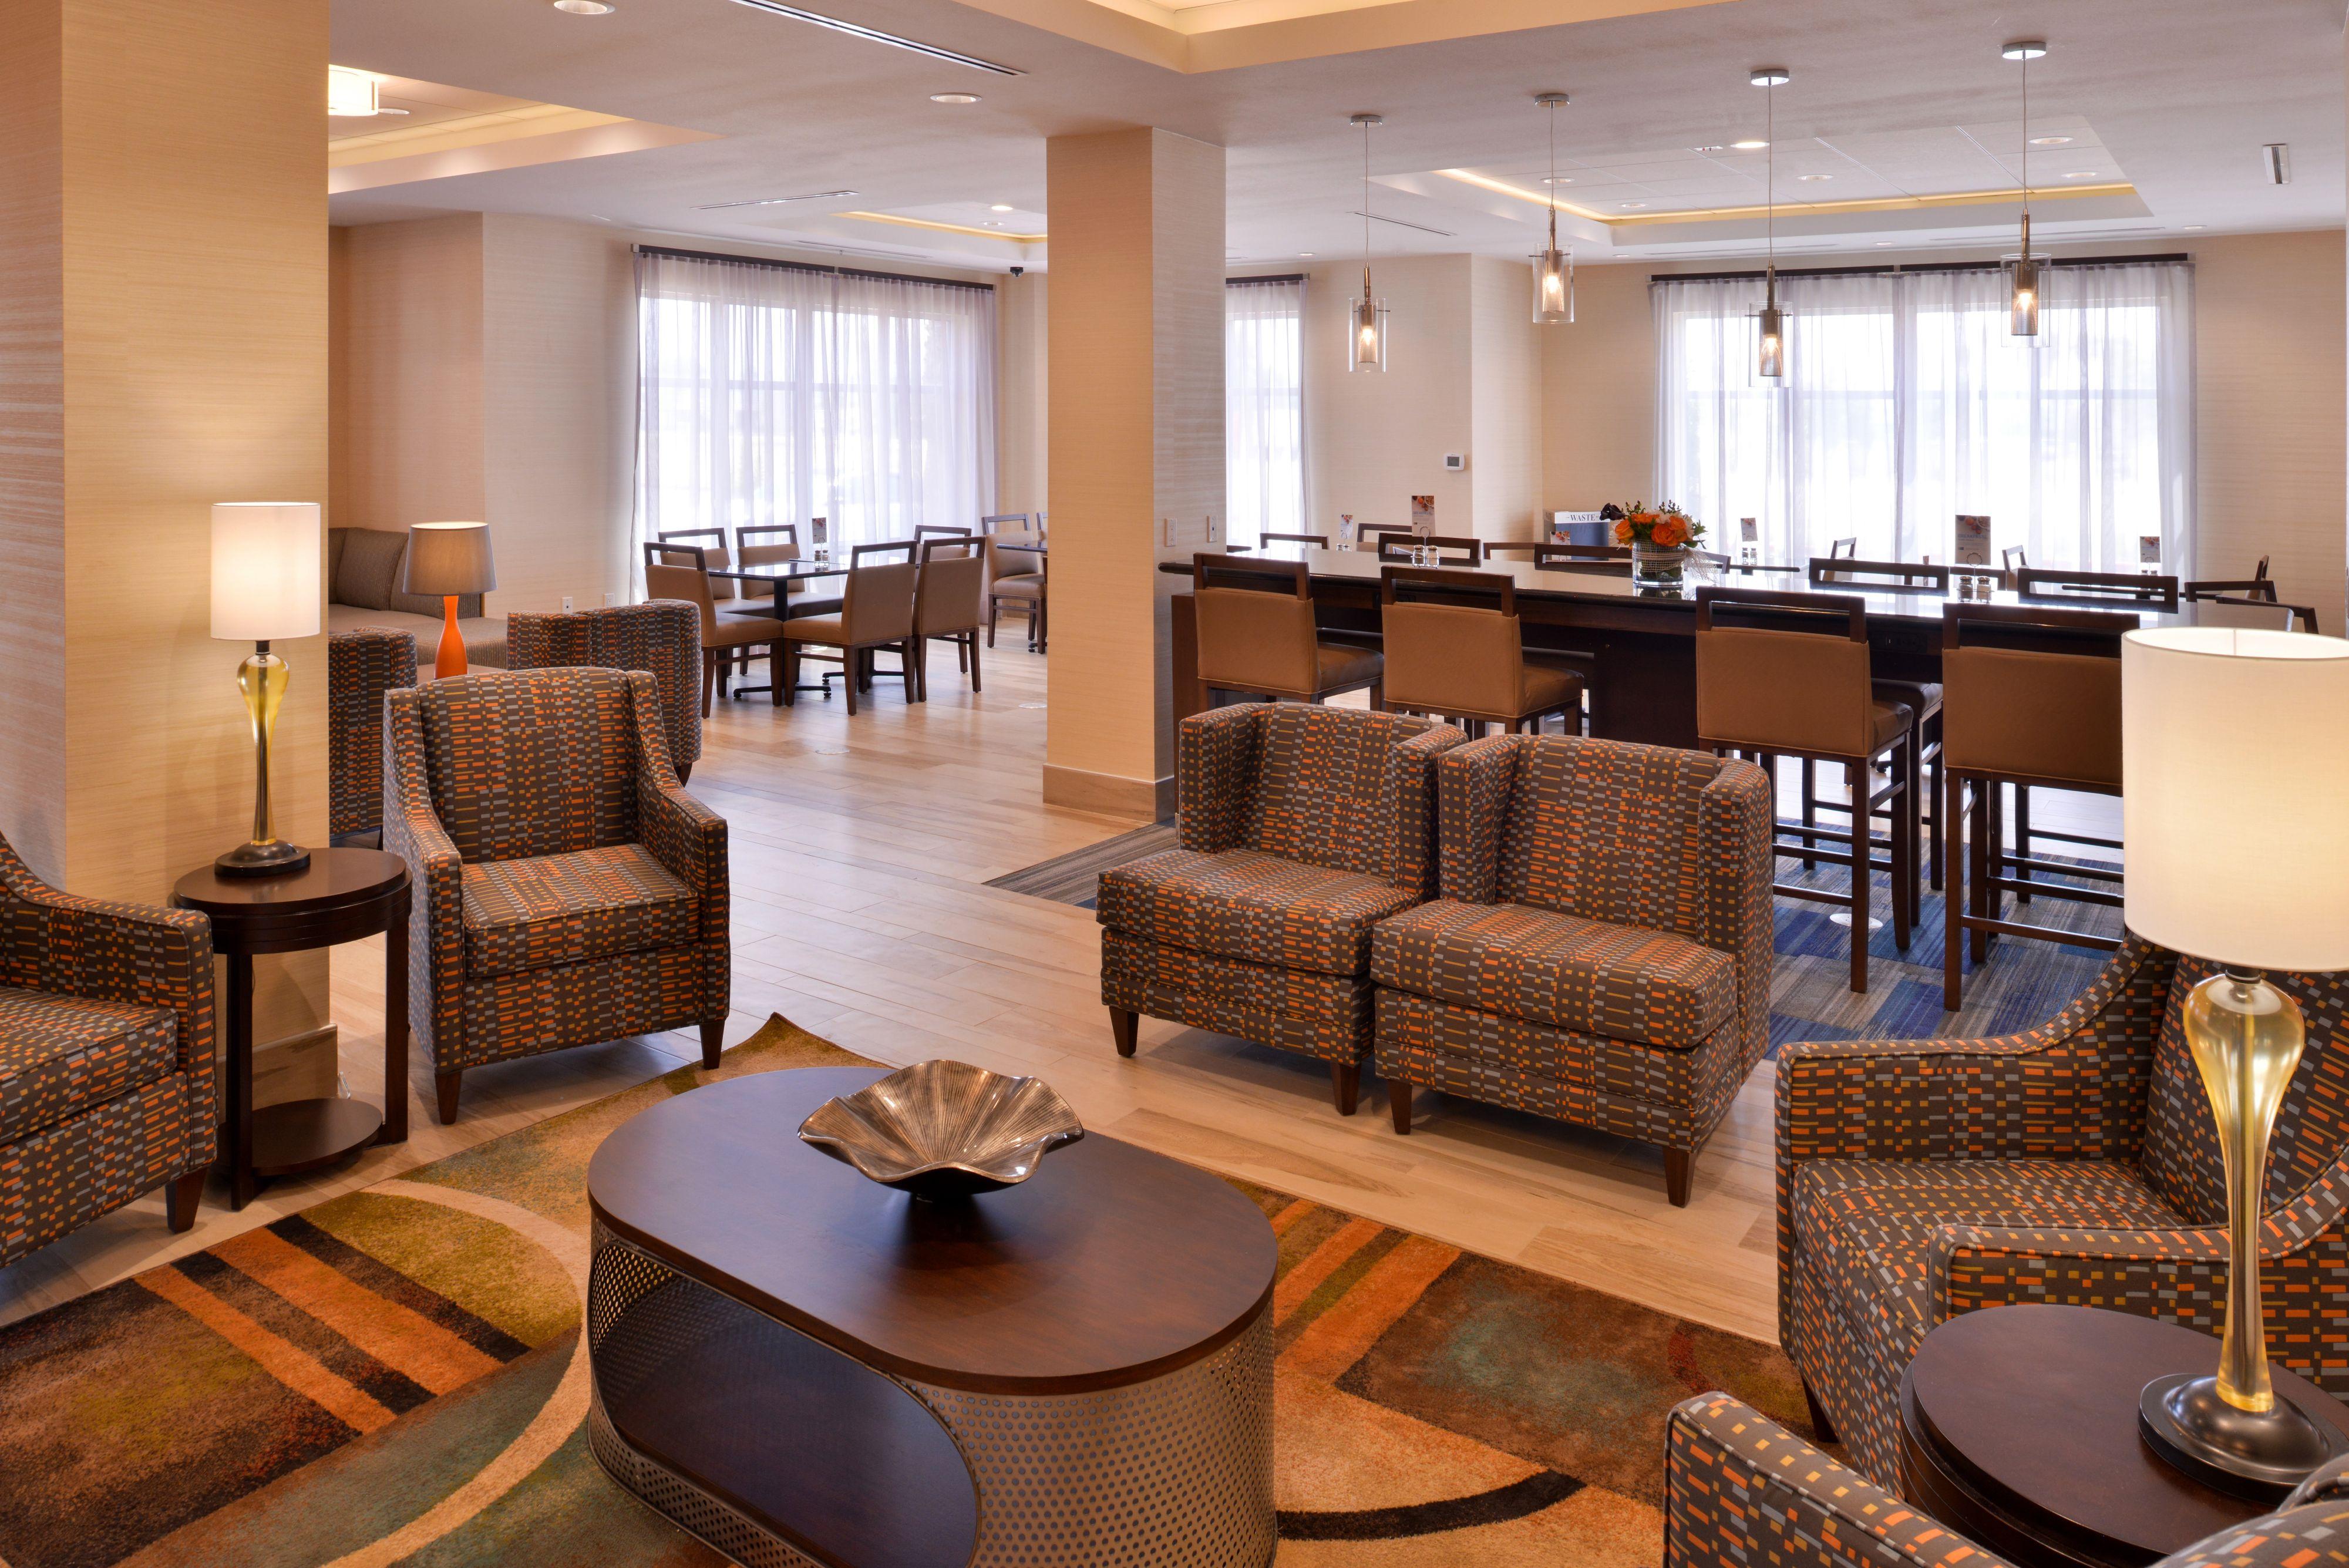 Holiday Inn Express & Suites Loma Linda- San Bernardino S image 3